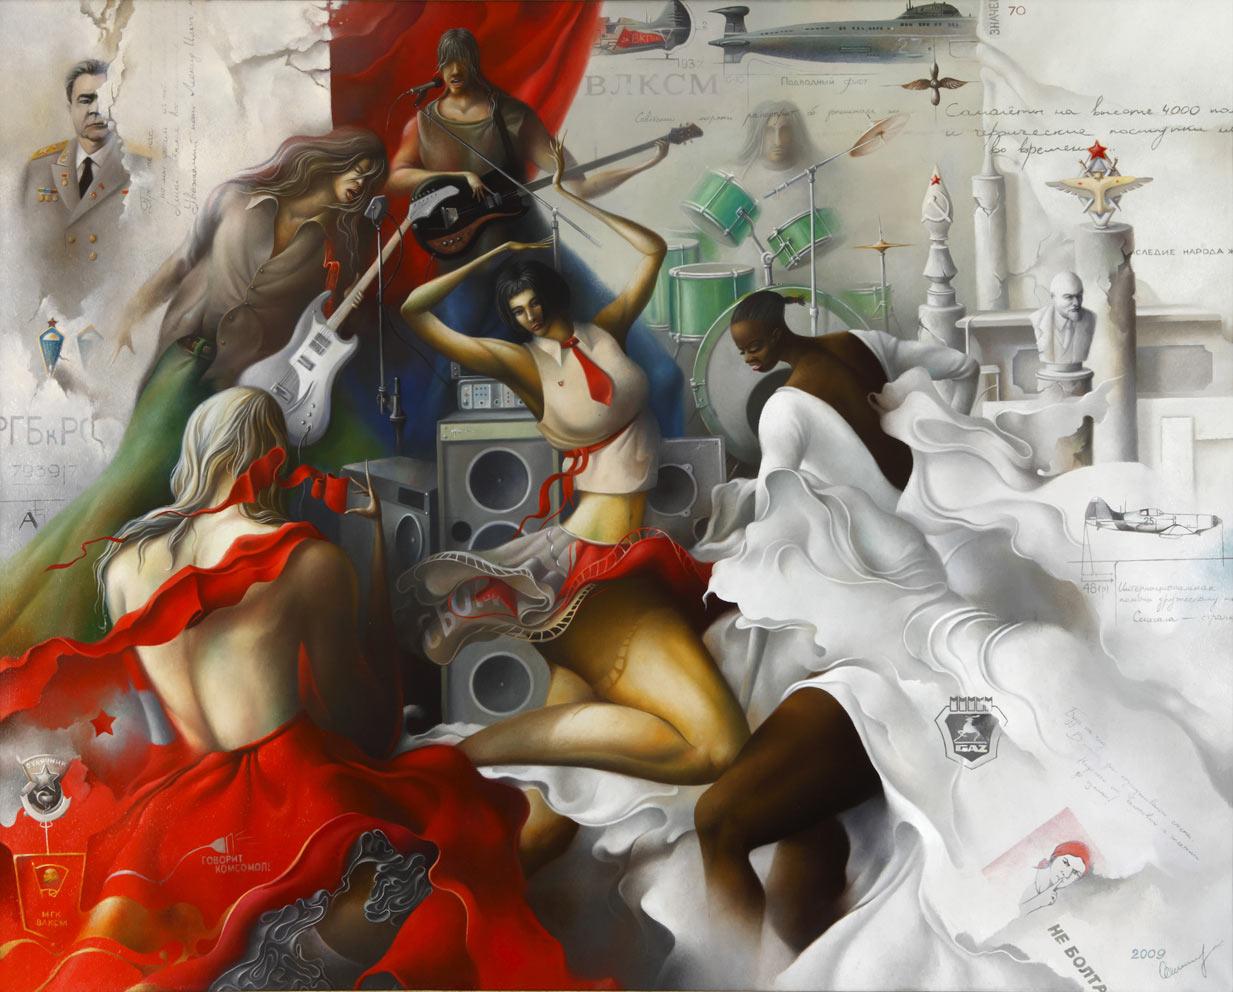 Last dance of outgoing era, 120x140 cm, oil on canvas, 2009.